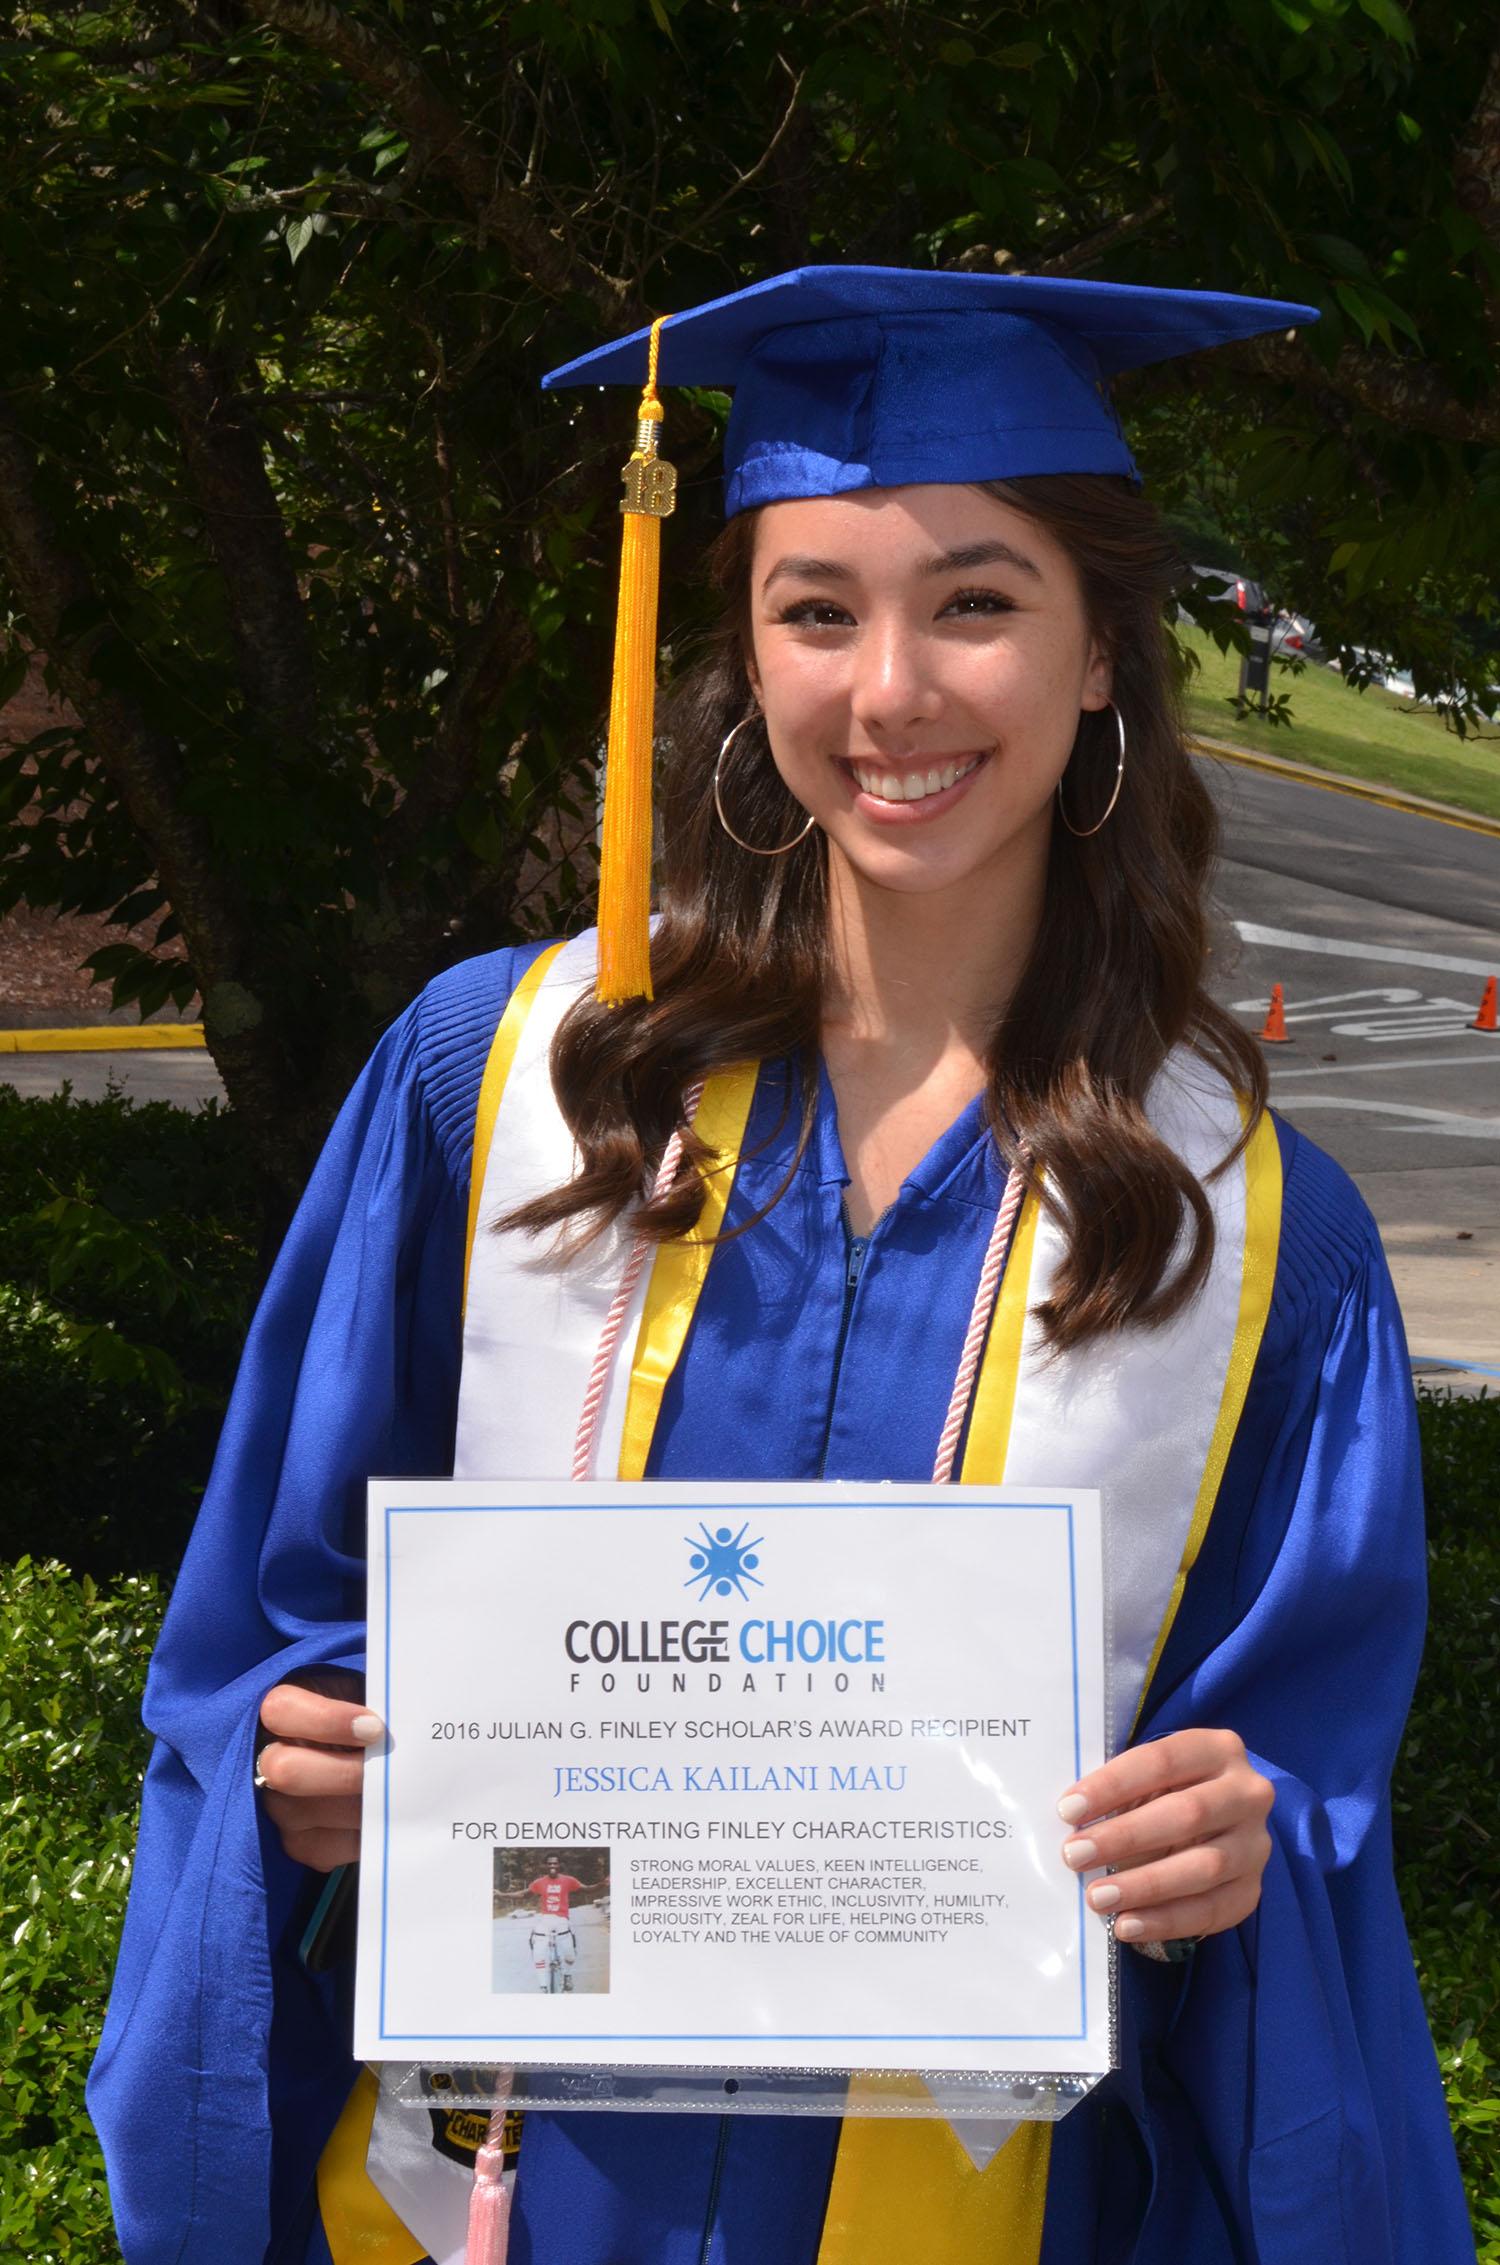 Jessica Mau 2018 Julian G. Finley Scholar's Award recipient College Choice Foundation.jpg